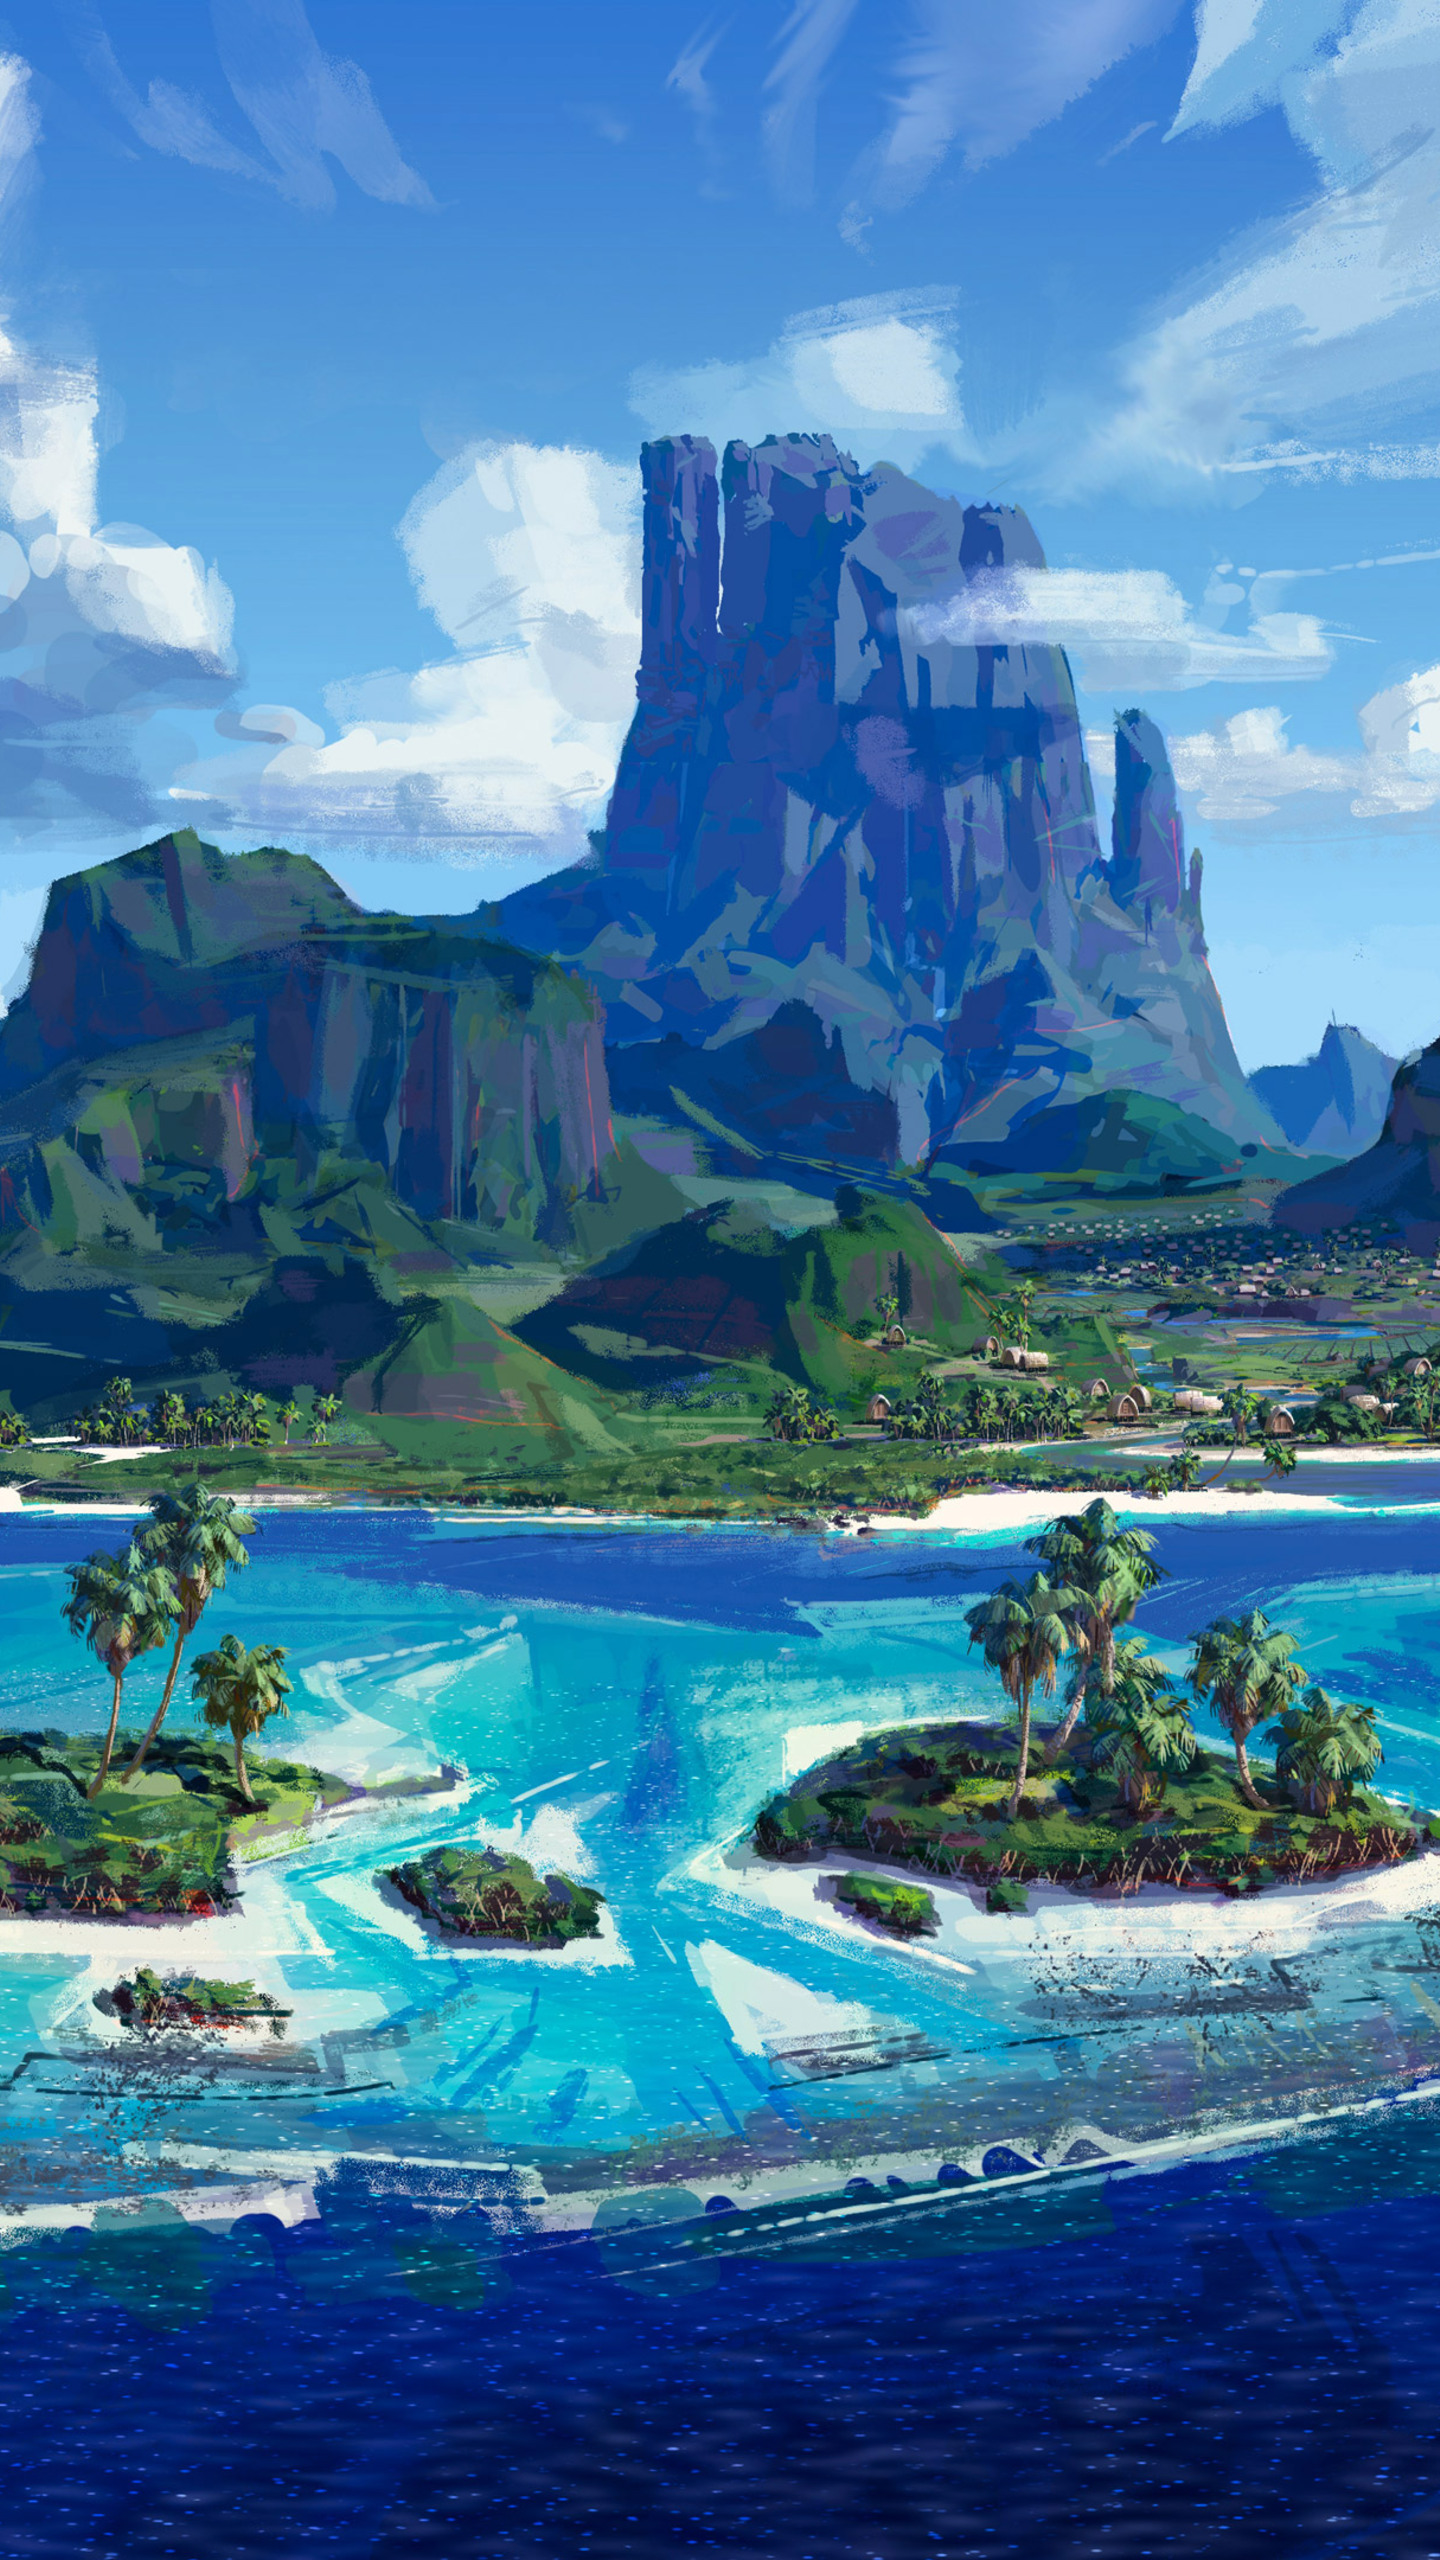 1440x2560 moana island samsung galaxy s6 s7 google pixel - Moana download hd ...